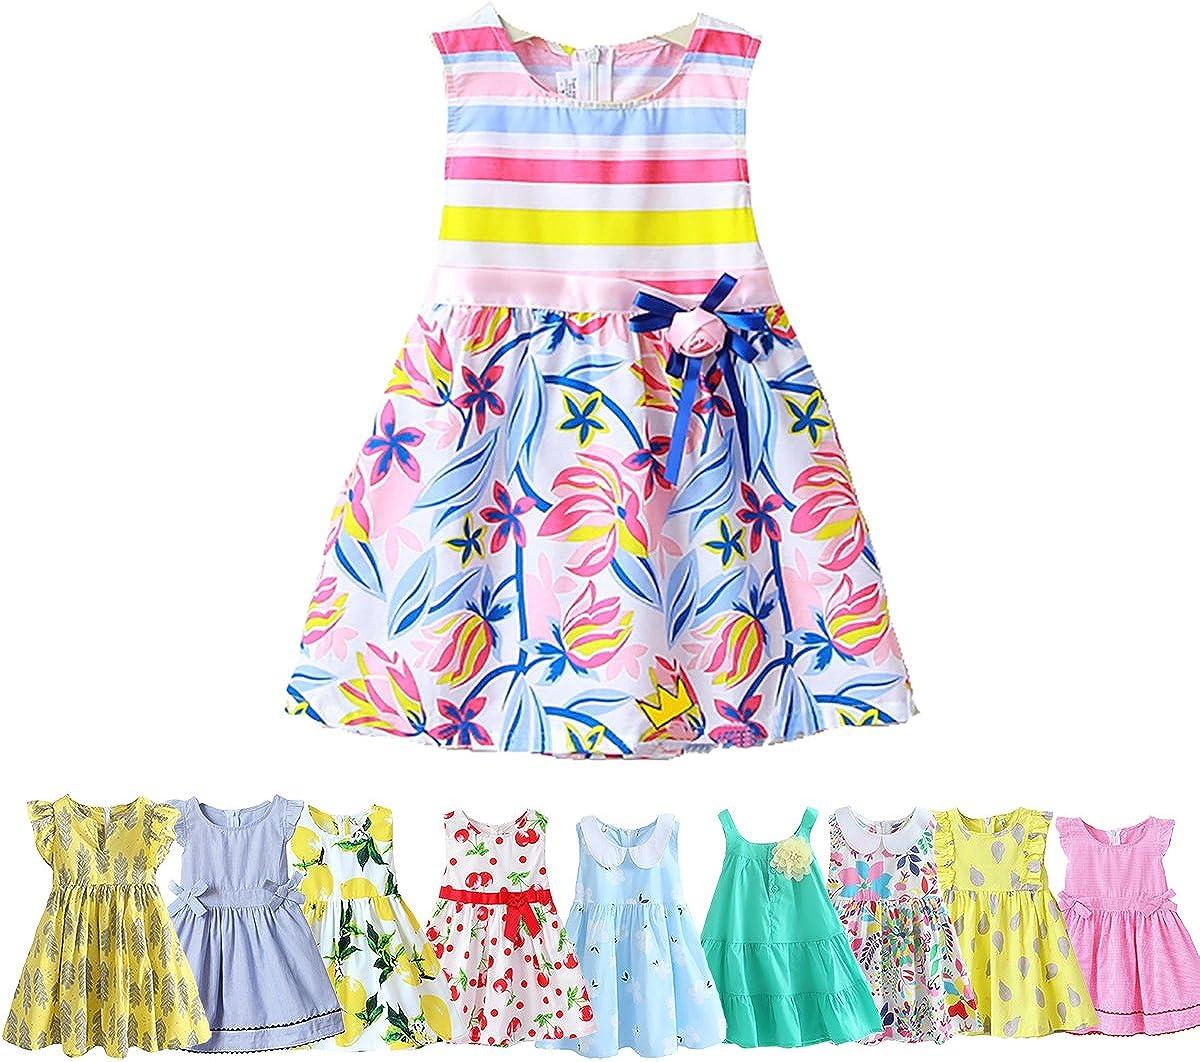 Abalacoco Girl Cotton Breathable Mesh Sleeveless Summer Tutu Daily Wear Princess Dress